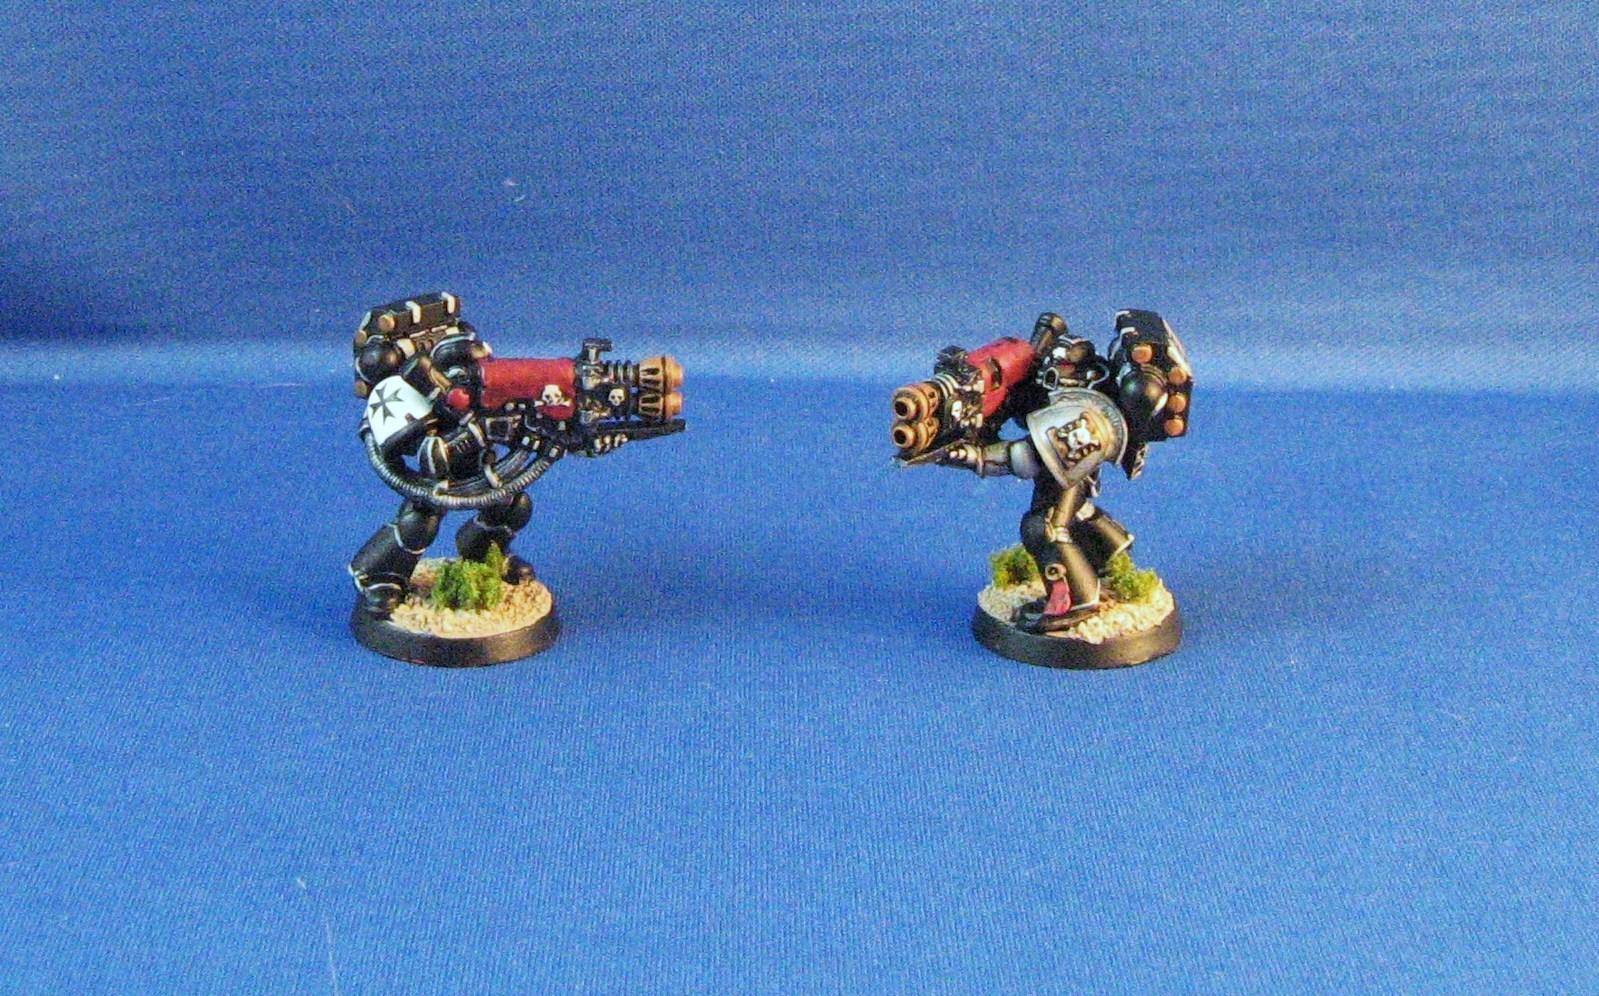 Black Templars, Deathwatch, Heavy Flamer, Sternguard